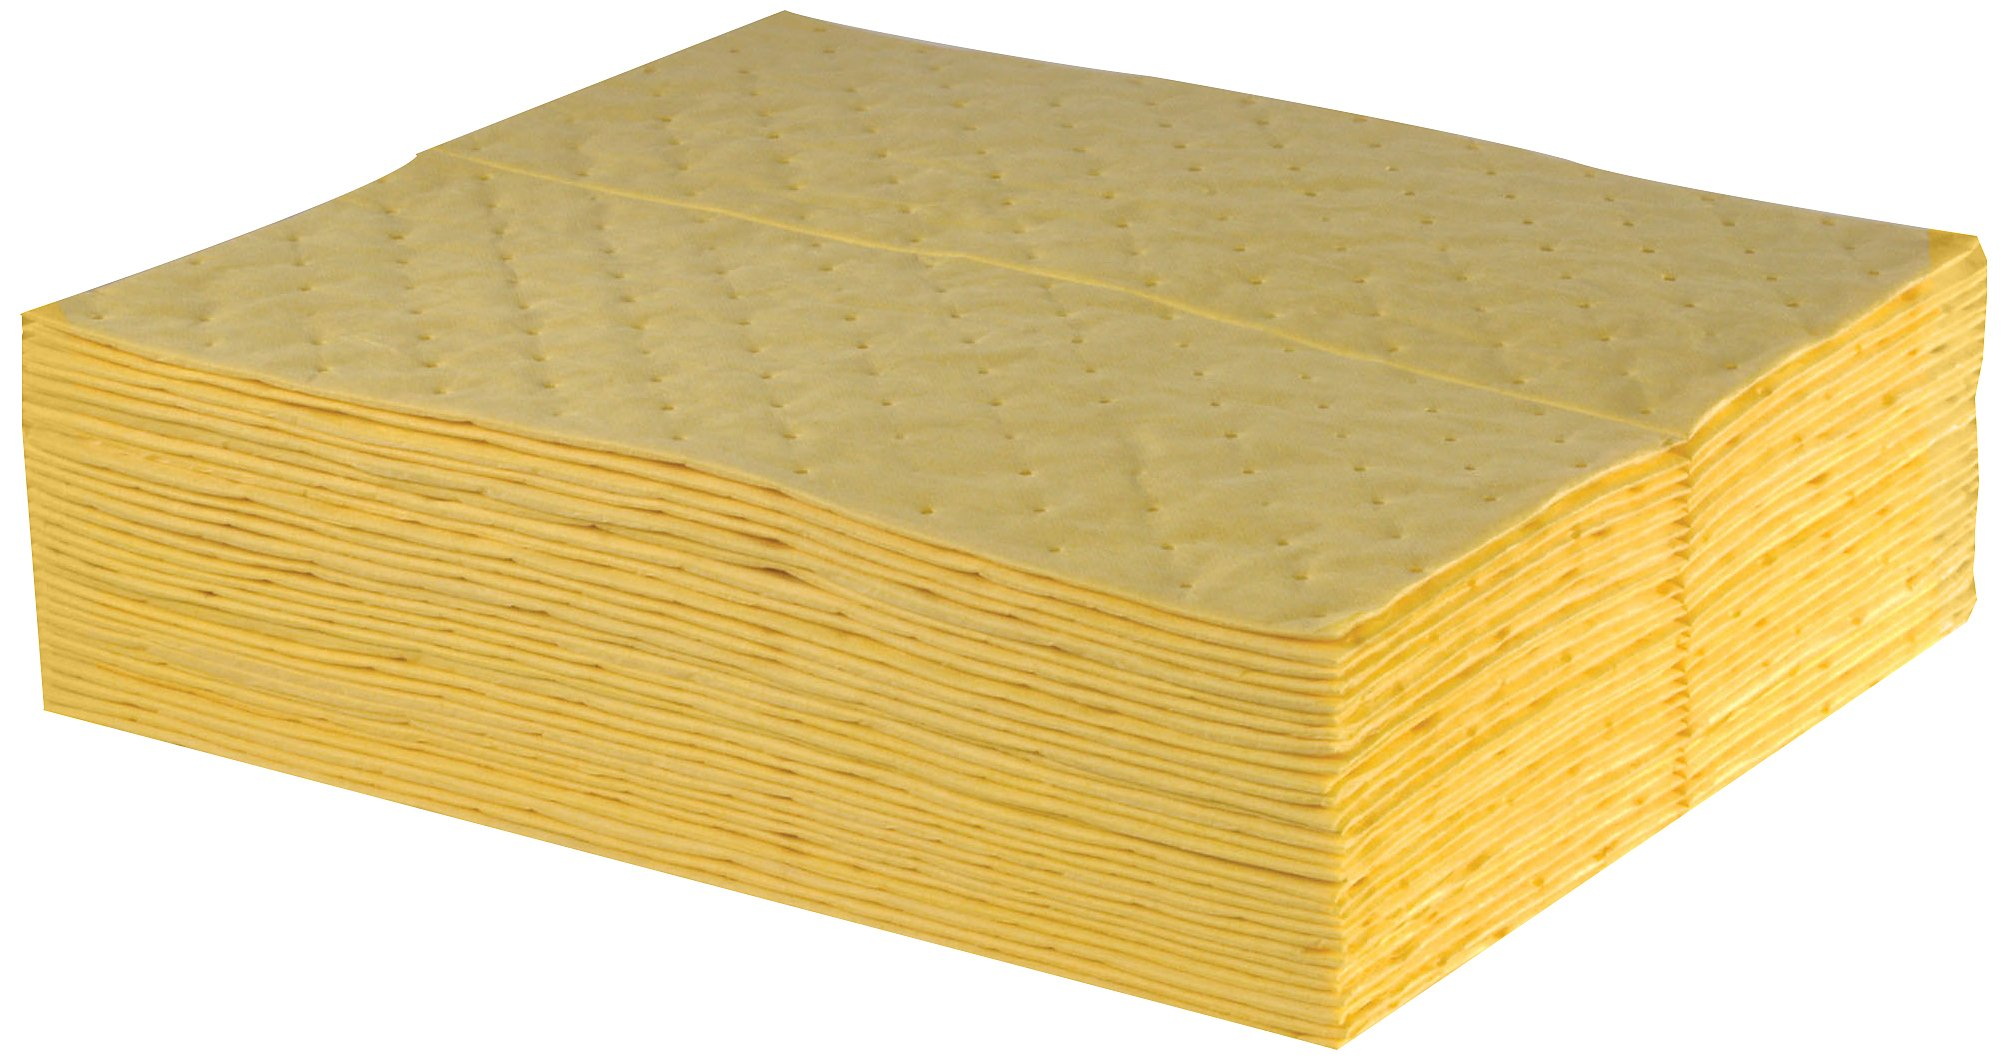 ESP 1AMYPL Airmatrix Polypropylene Heavy Weight Chemical Hazmat Absorbent Laminated Pad, 18'' Length x 16'' Width, Yellow (100 Per Bale)